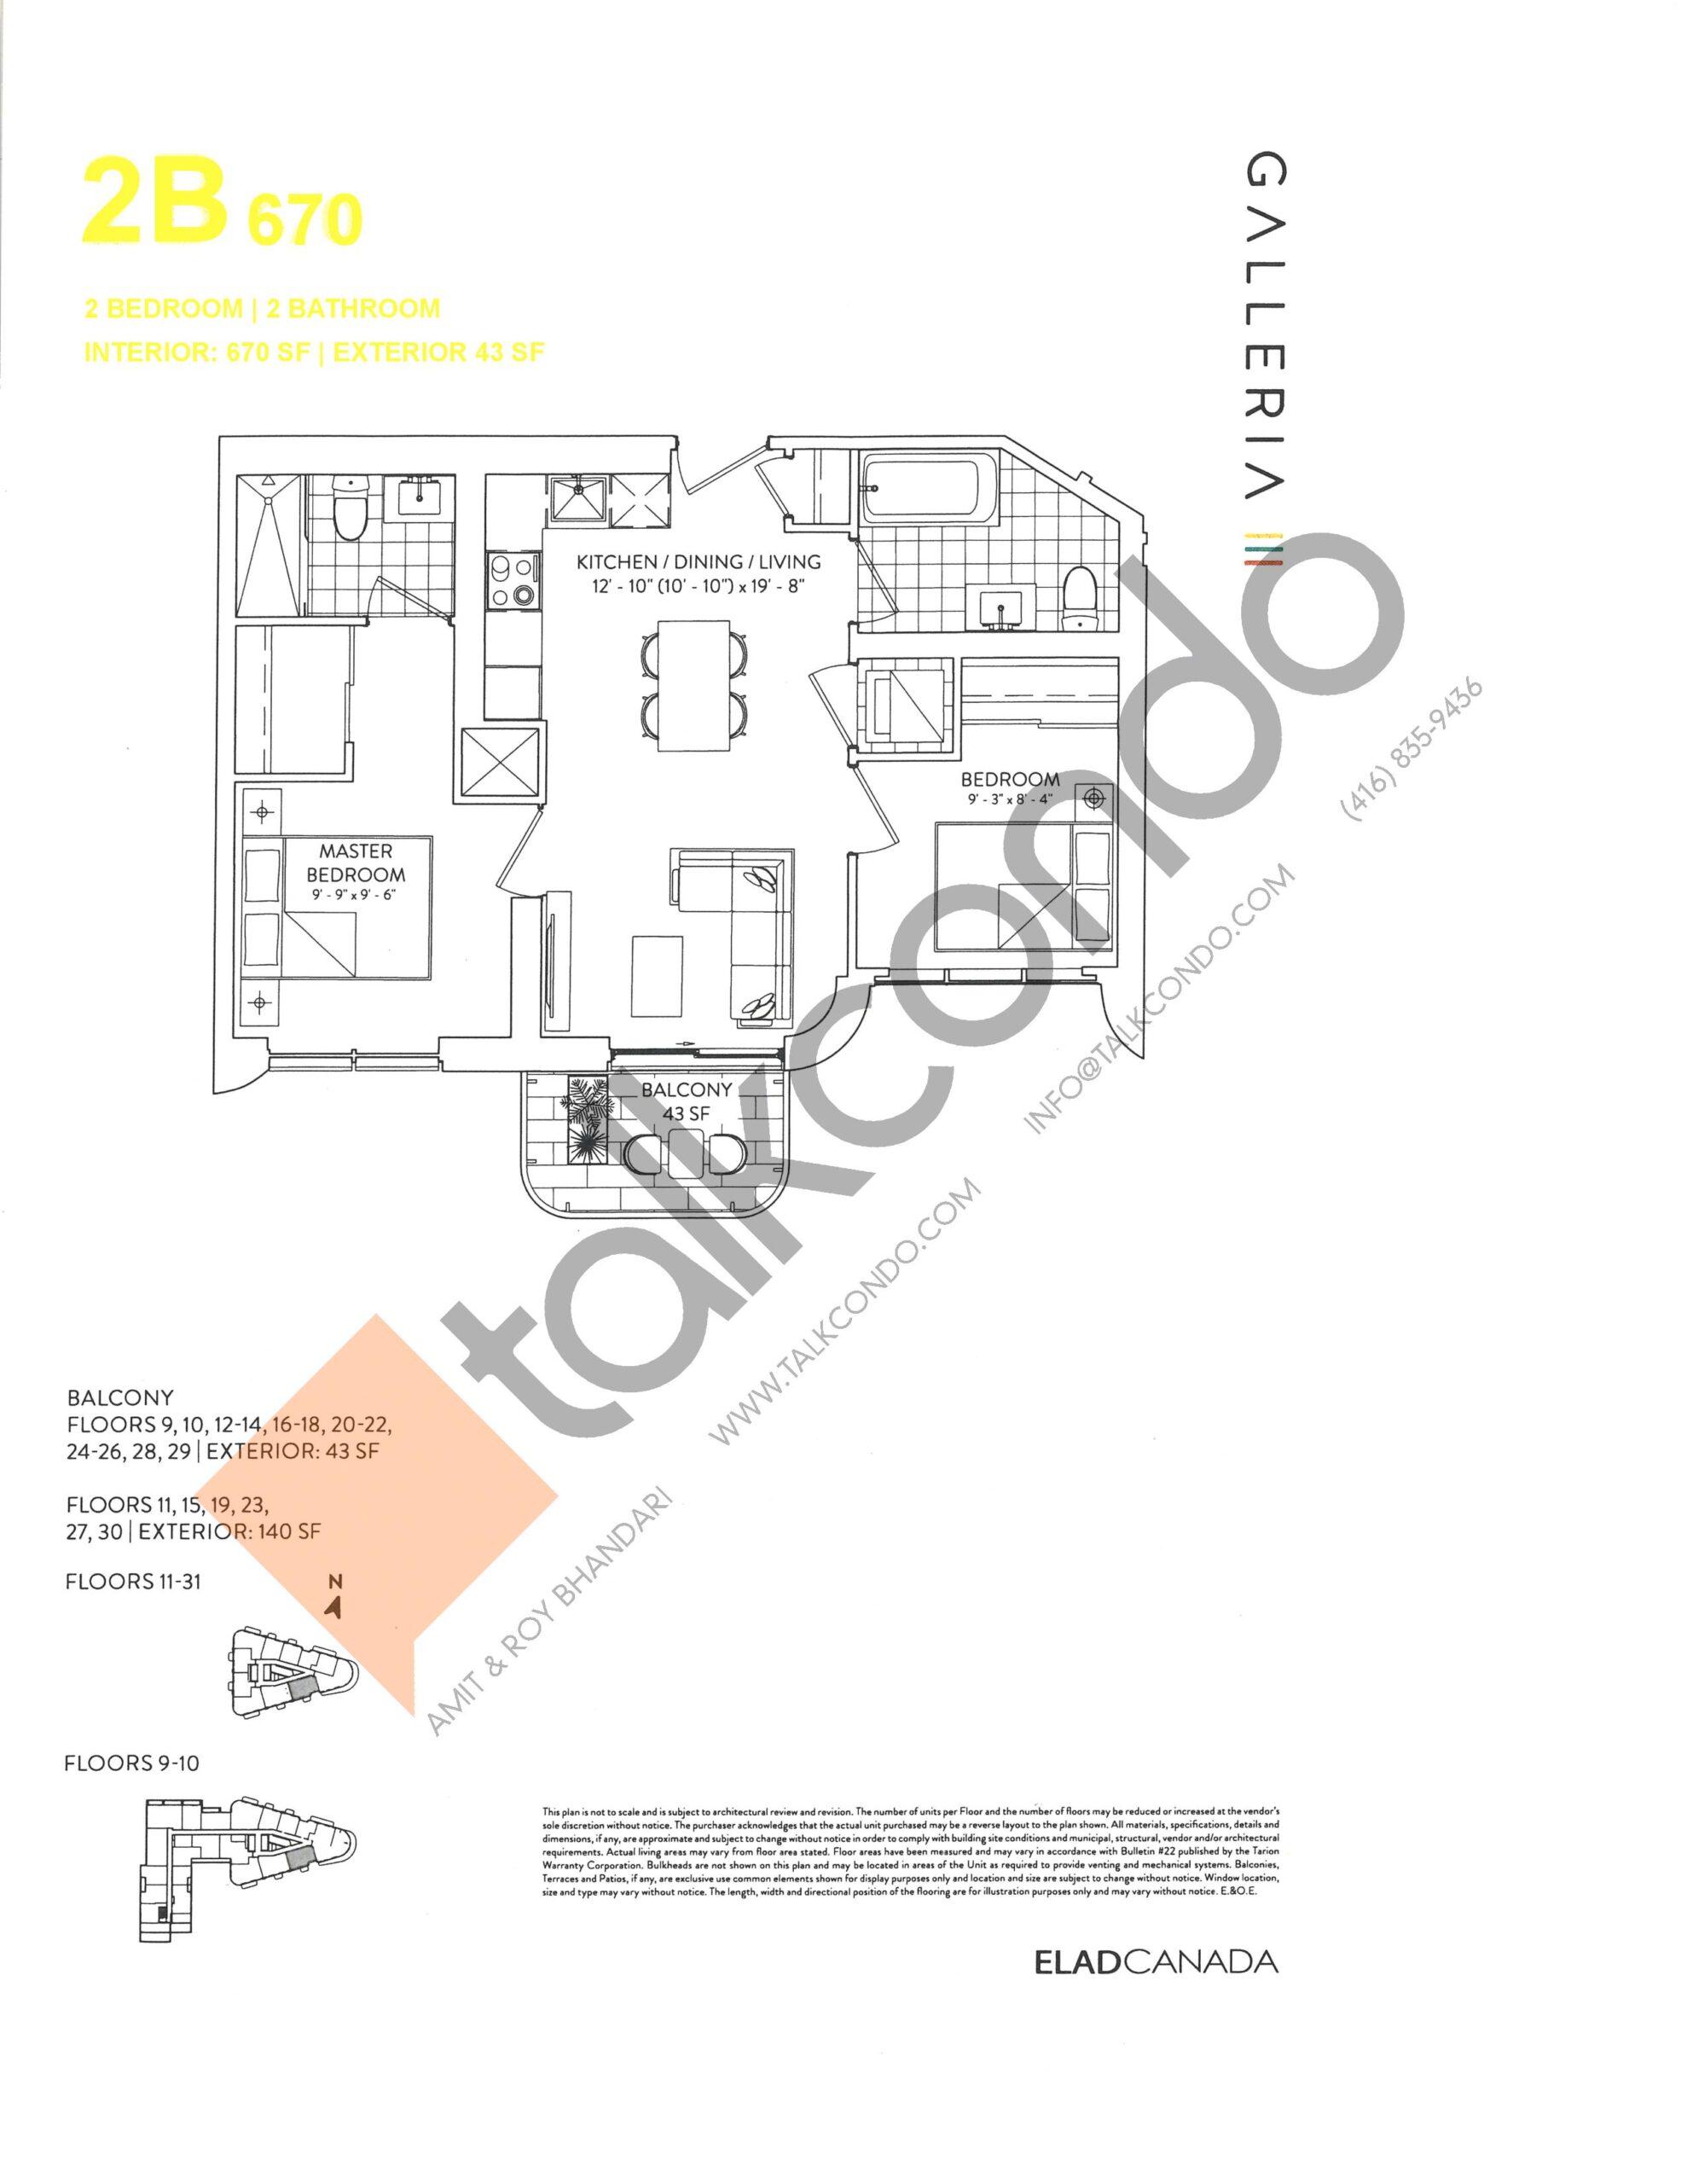 2B 670 Floor Plan at Galleria 03 Condos - 670 sq.ft